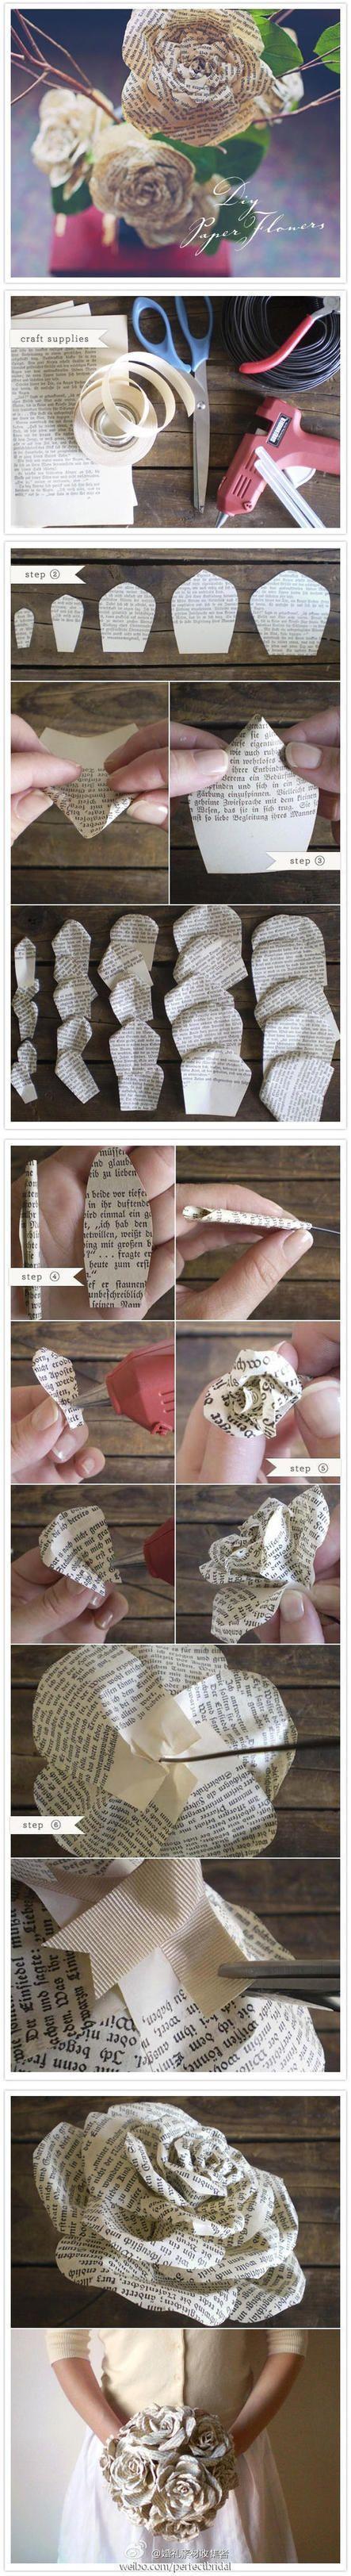 Wedding - Book Art - Paper Roses